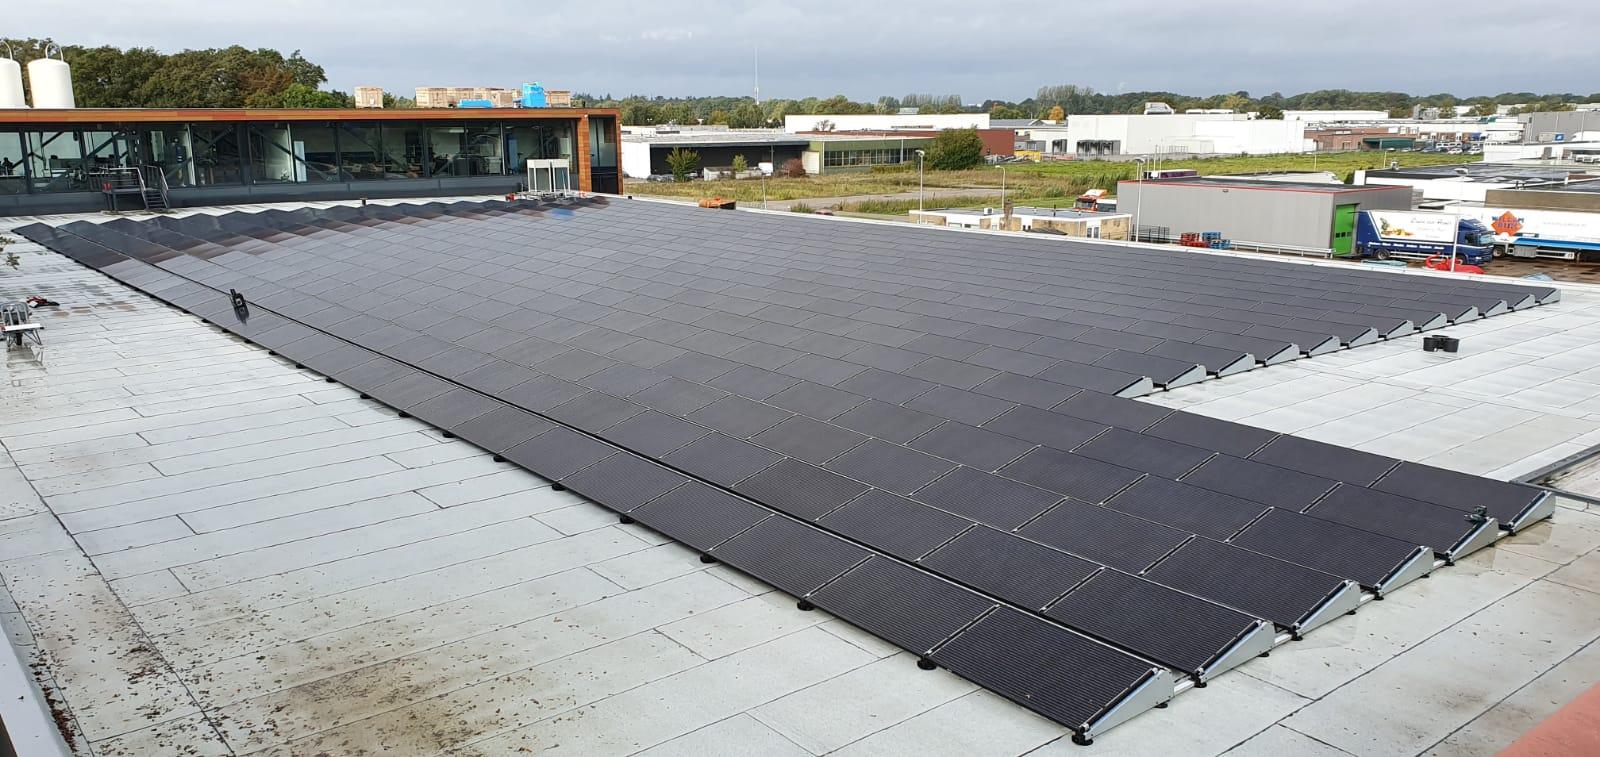 willemdijk agf 1350 panelen